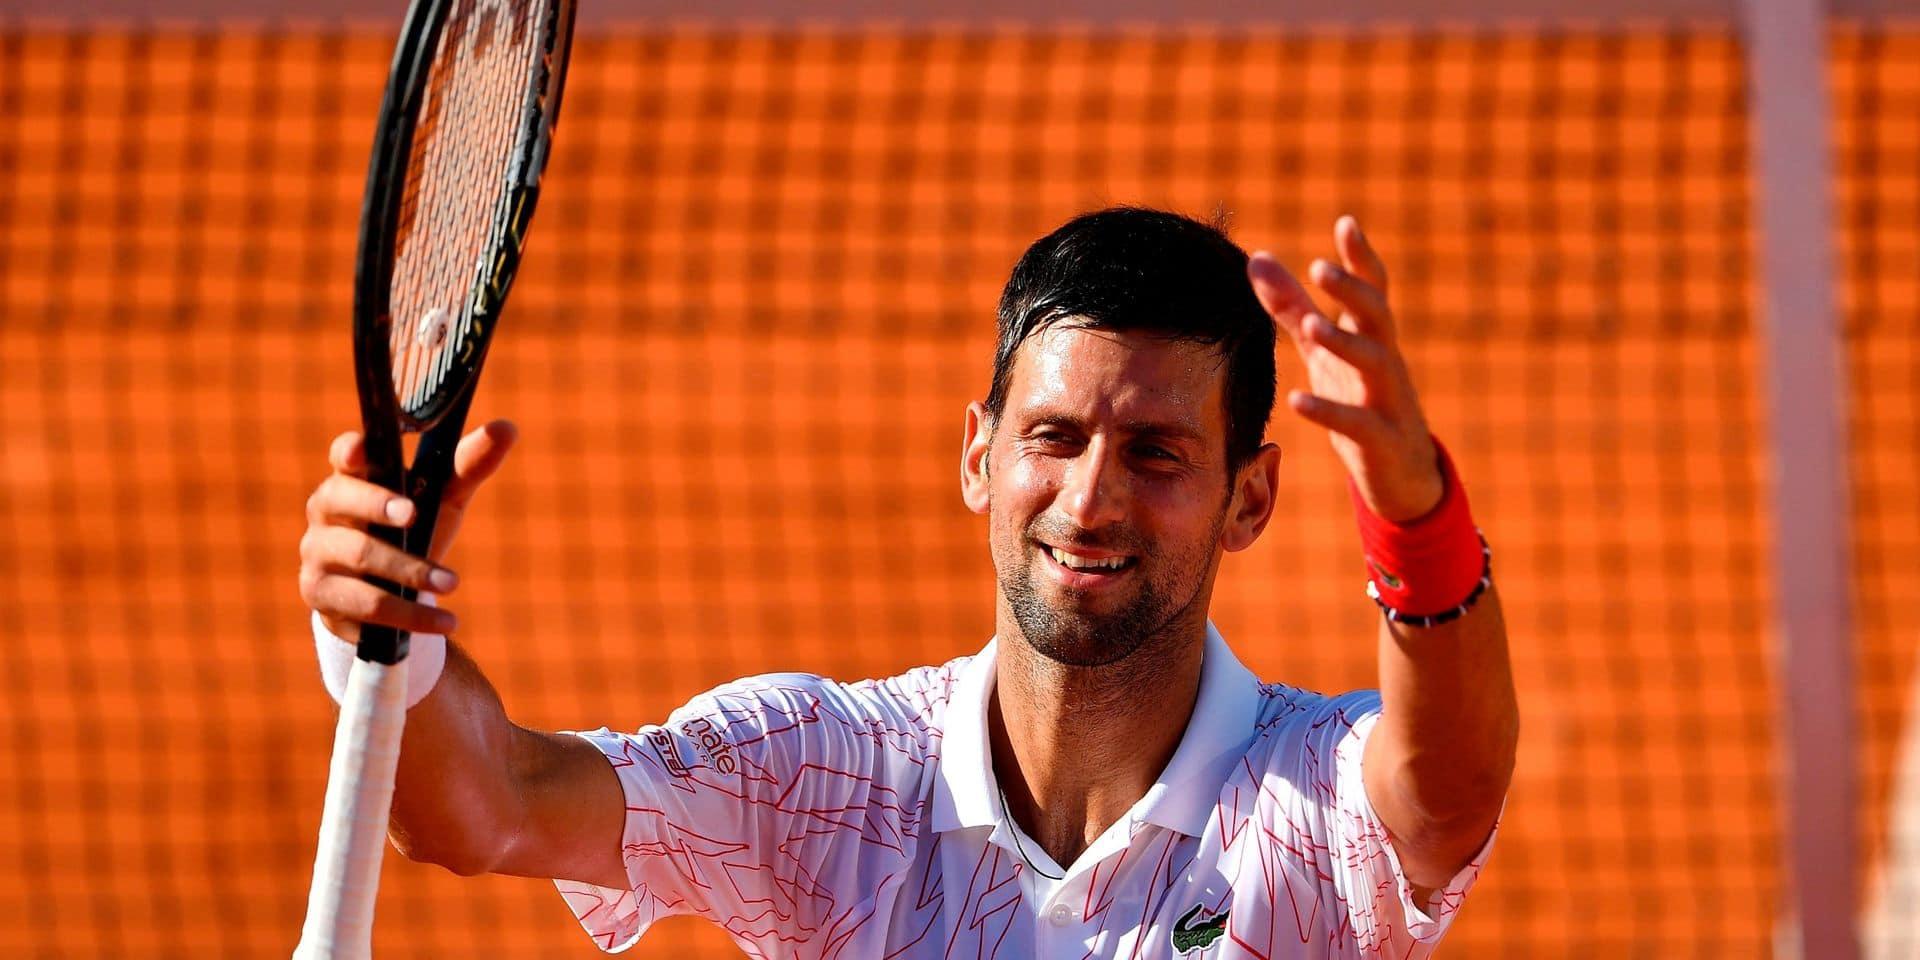 L'autre regard: Novak Djokovic et l'exemplarité